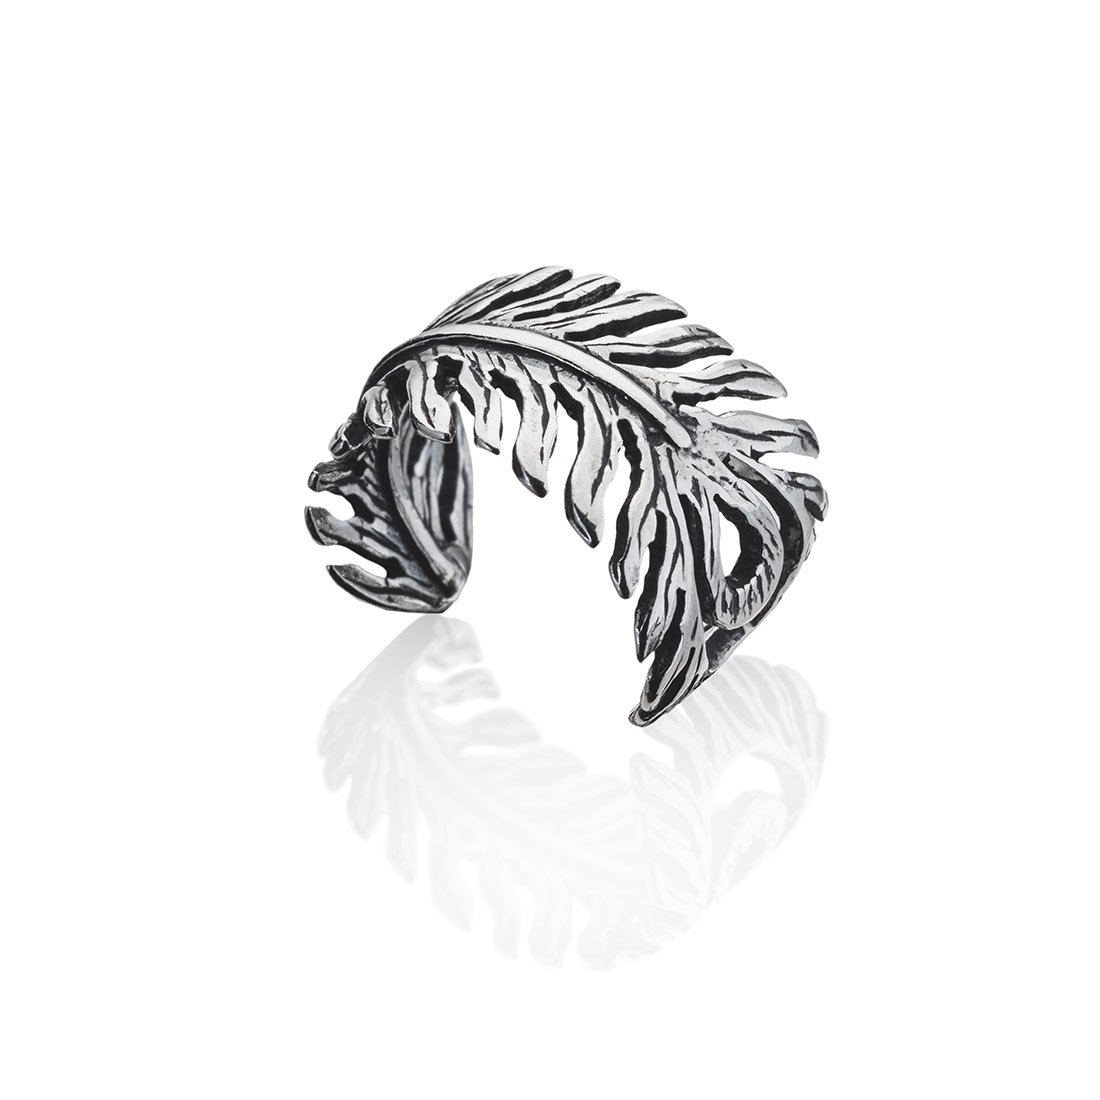 Sampson Ear Cuff - Feather Sterling Silver - Fake Piercing - Fake Conch Piercing - Non Pierced Conch Cuff